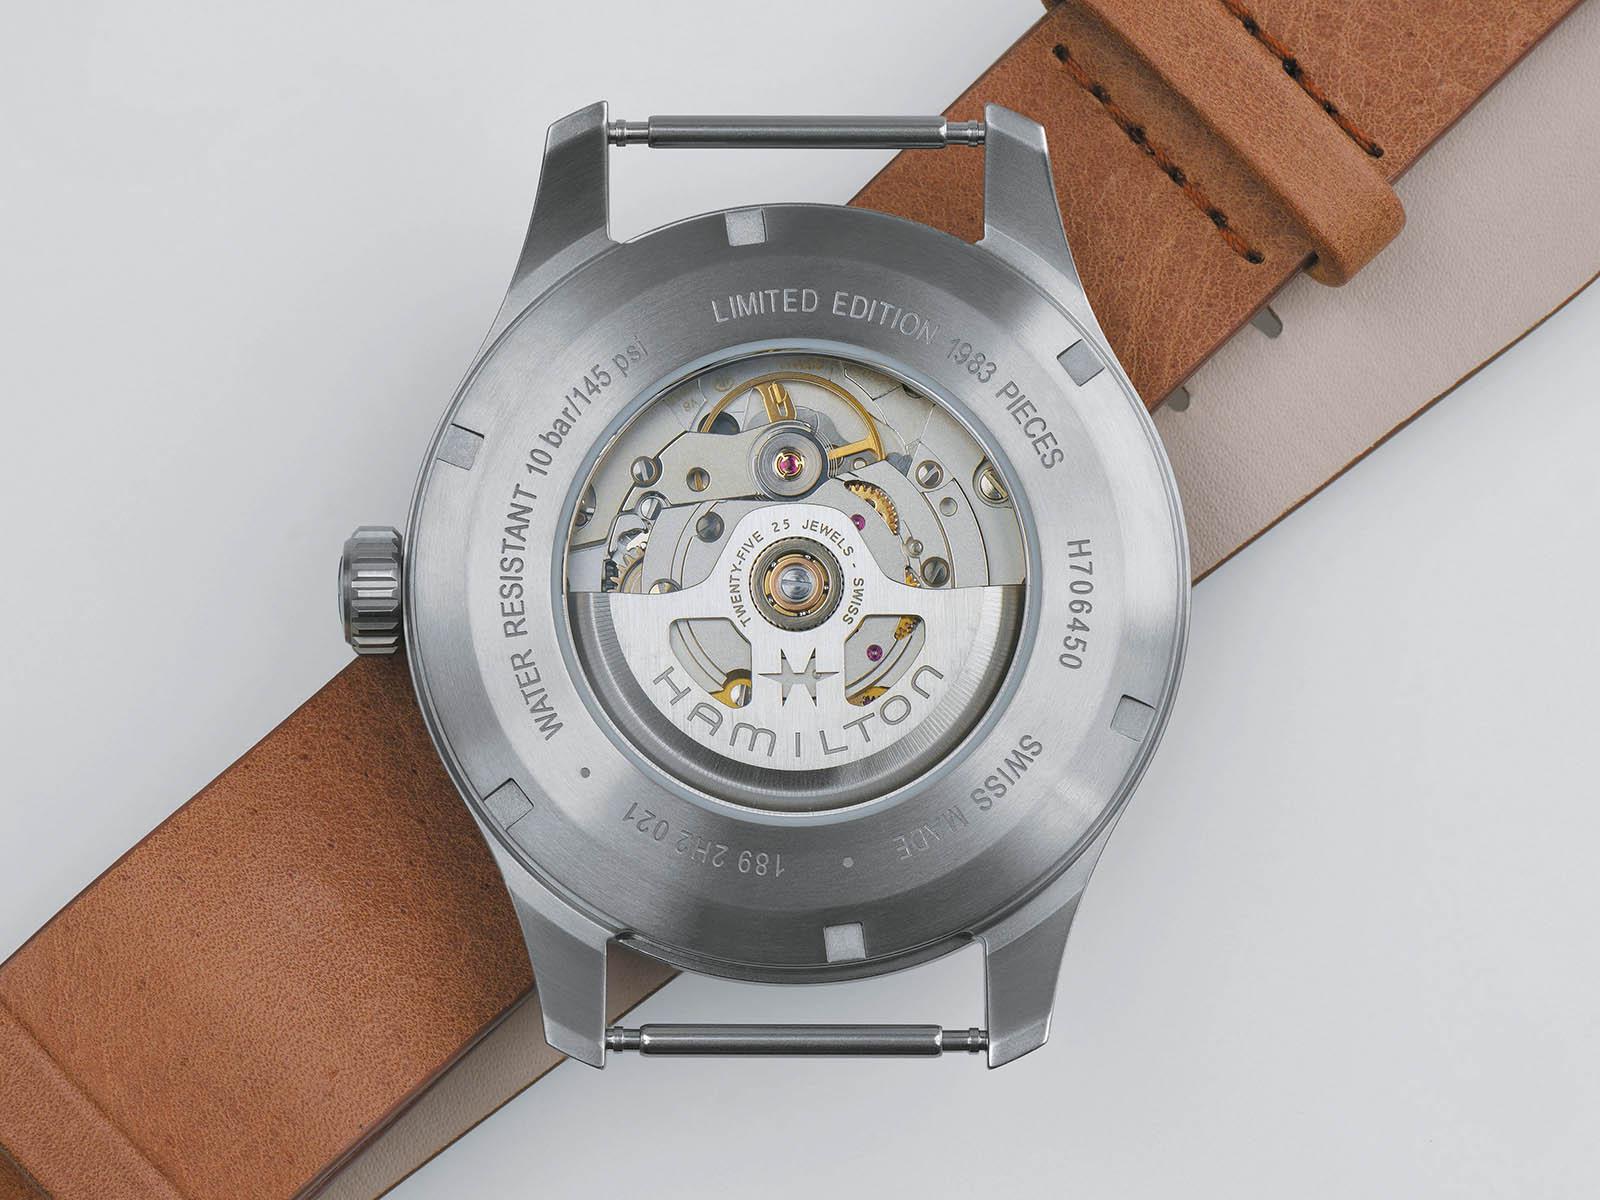 h70645533-hamilton-far-cry-6-khaki-field-titanium-limited-edition-9.jpg